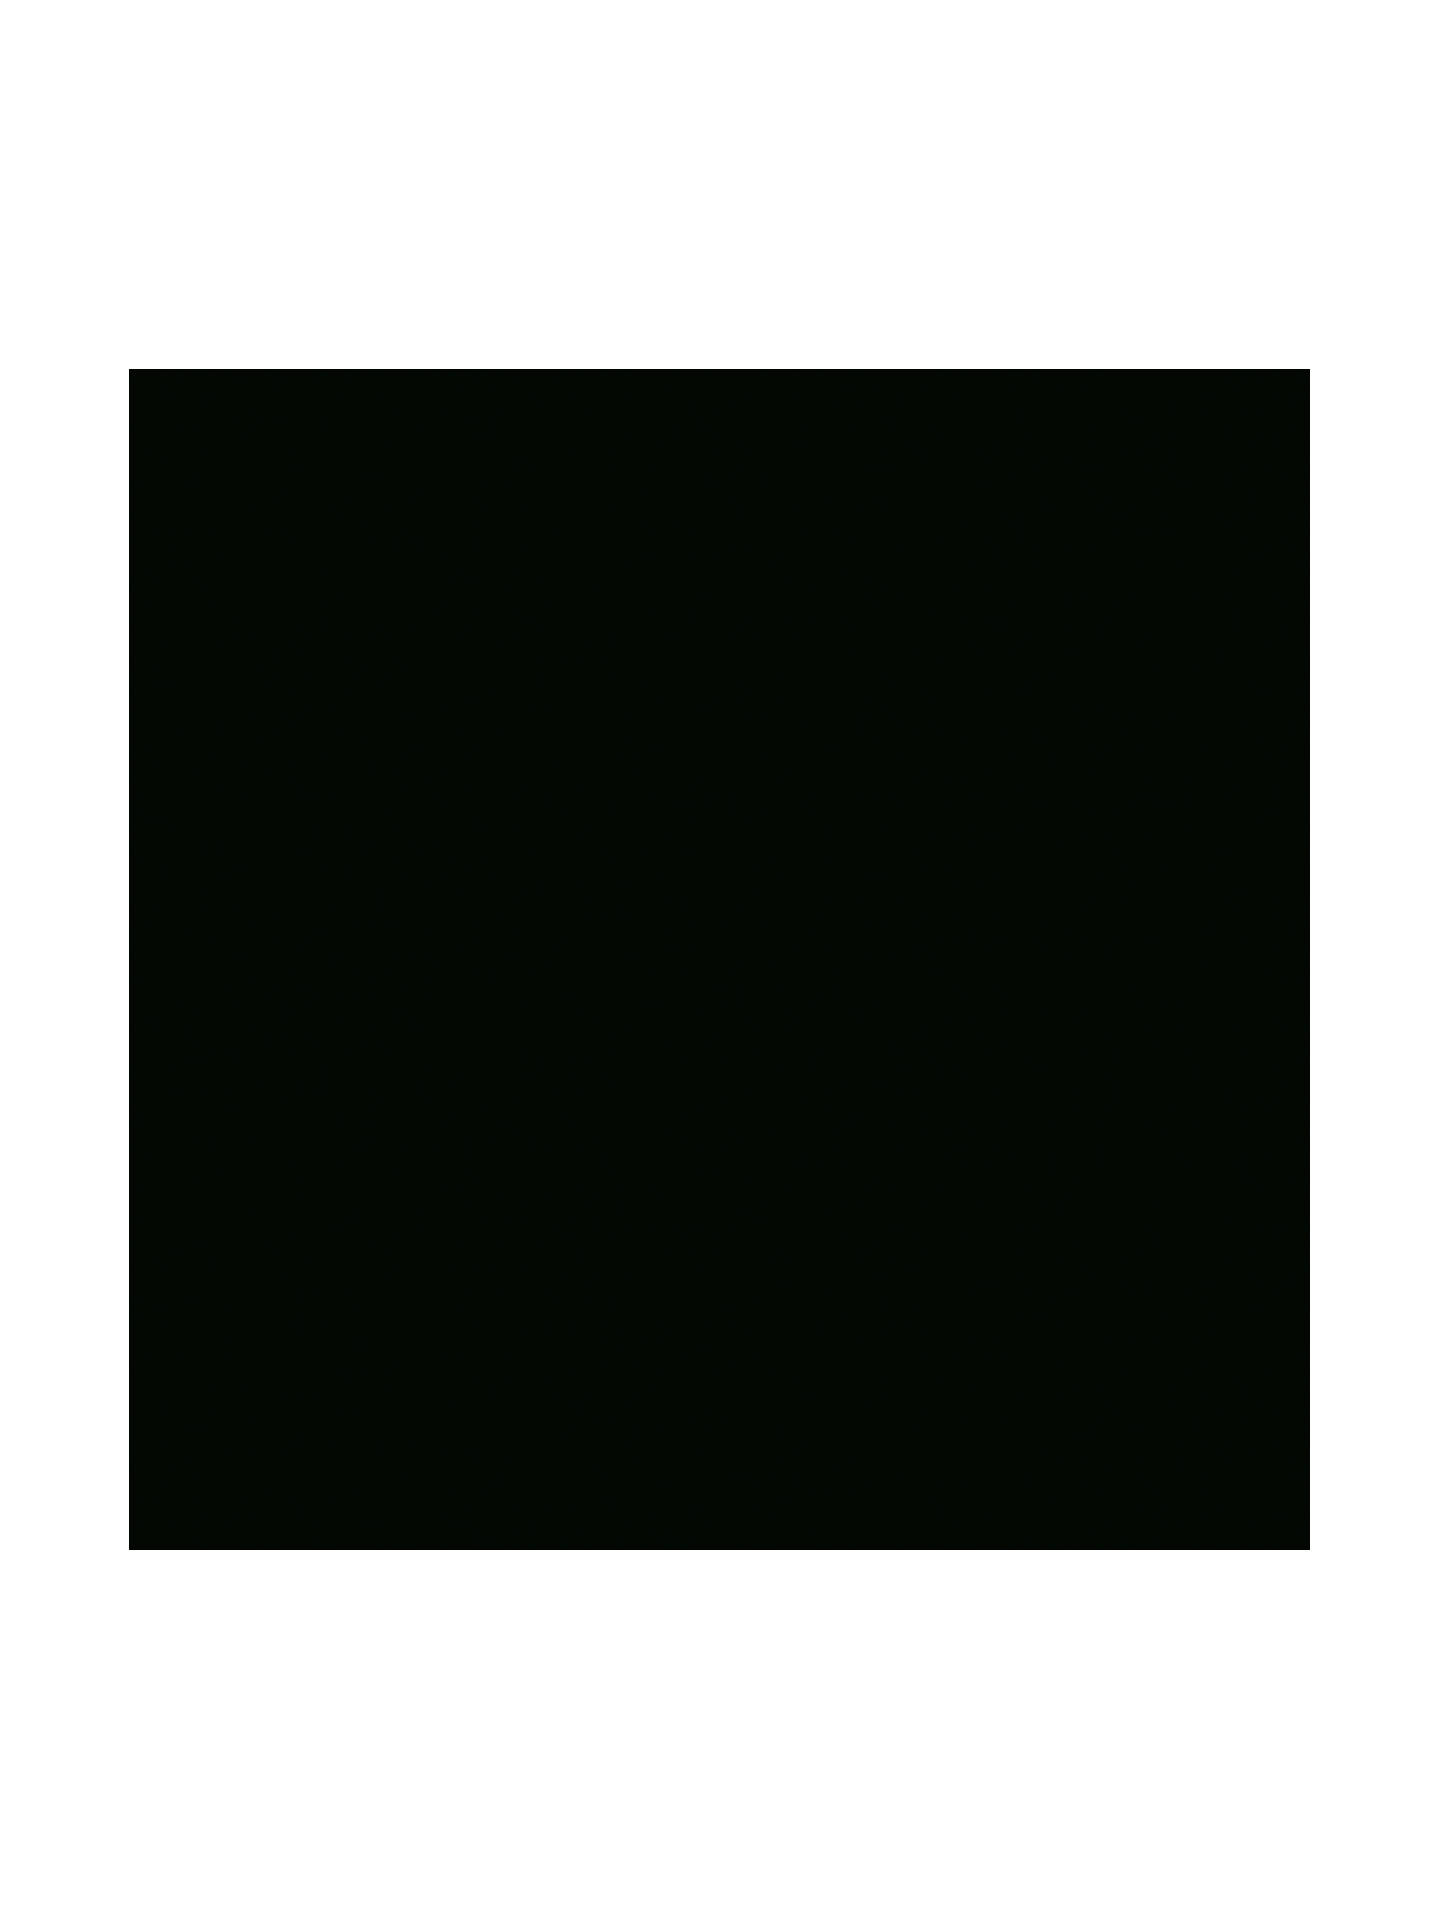 john lewis partners smooth superior 10 vinyl flooring at john lewis partners. Black Bedroom Furniture Sets. Home Design Ideas